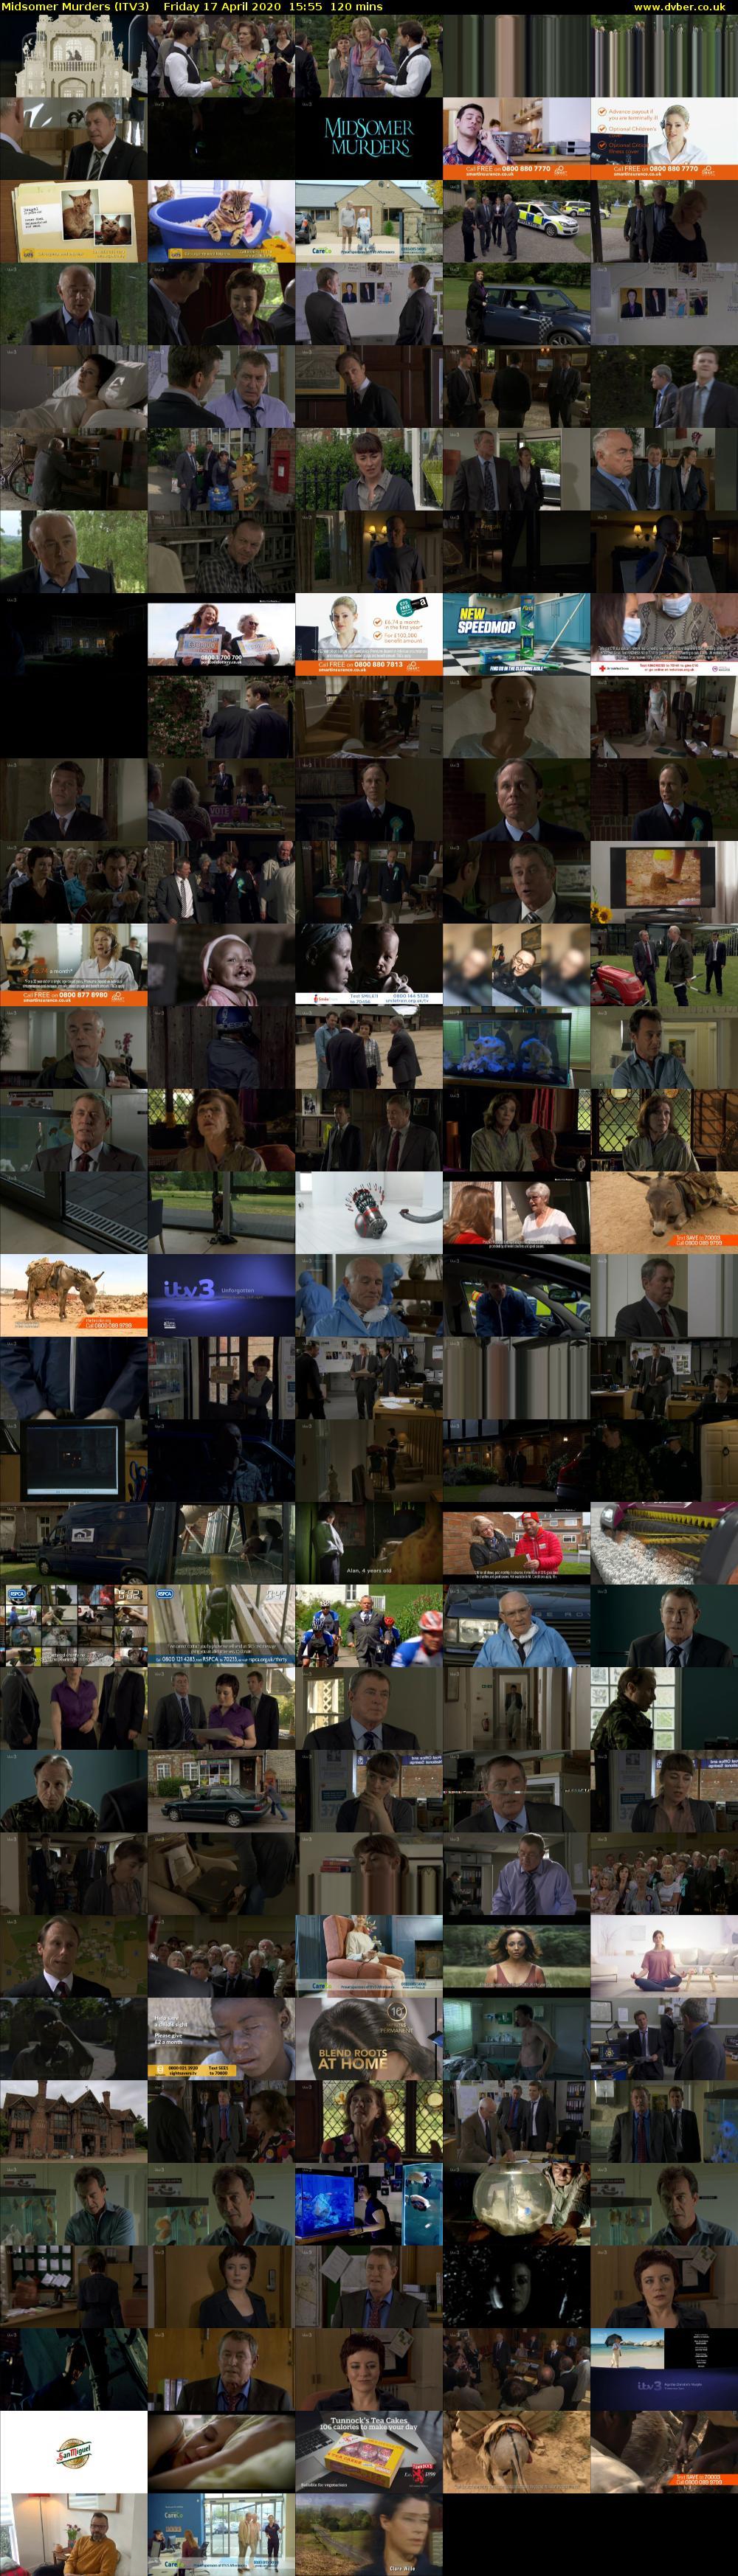 Midsomer Murders (ITV3) - 2020-04-17-1555